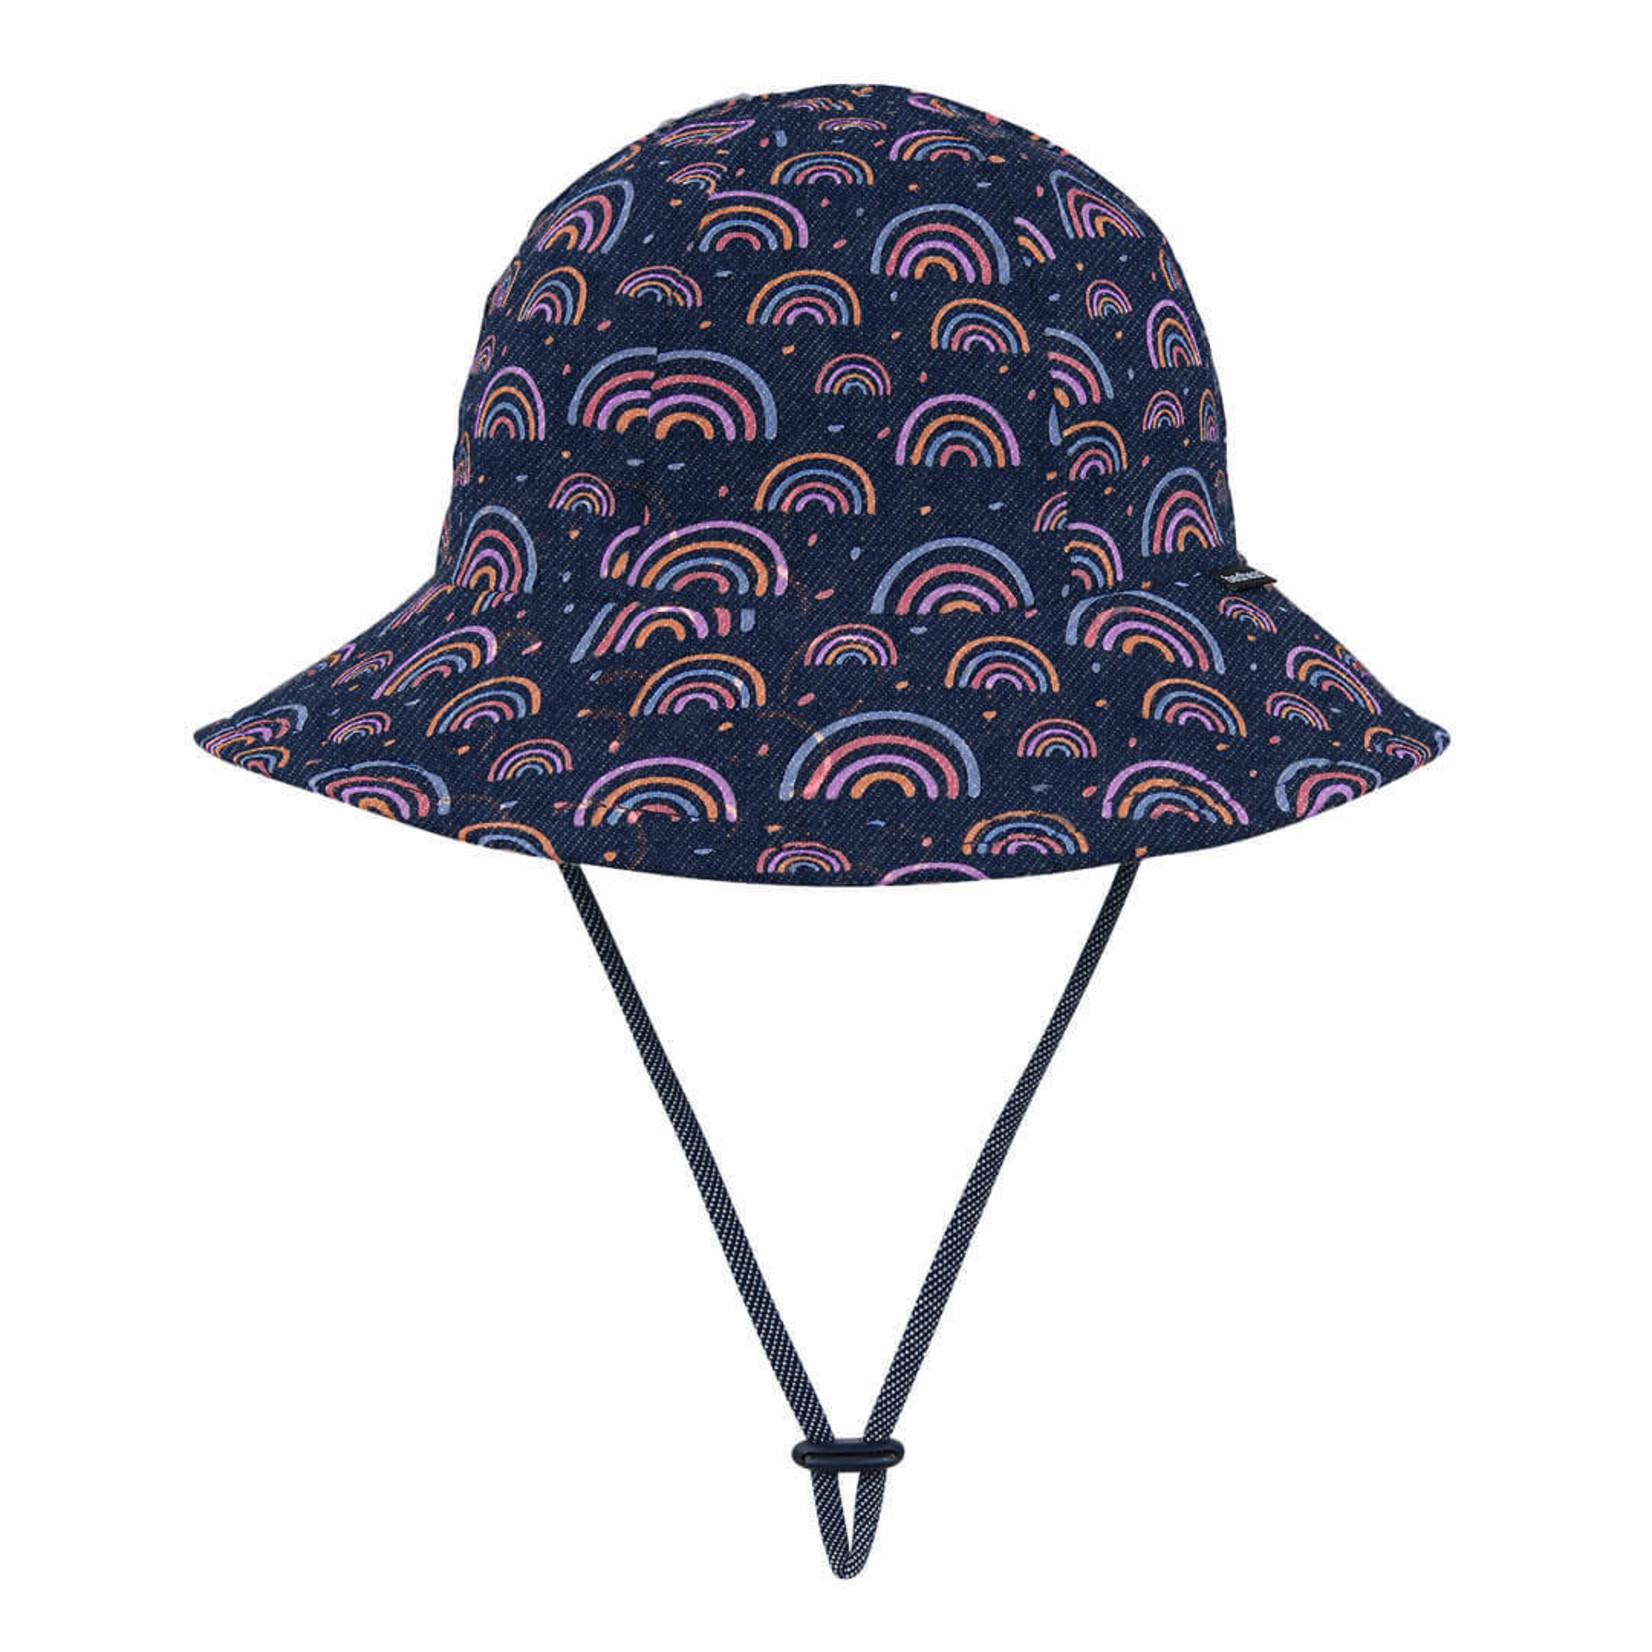 Bedhead Hats Bedhead Ponytail Bucket Hat - Rainbow